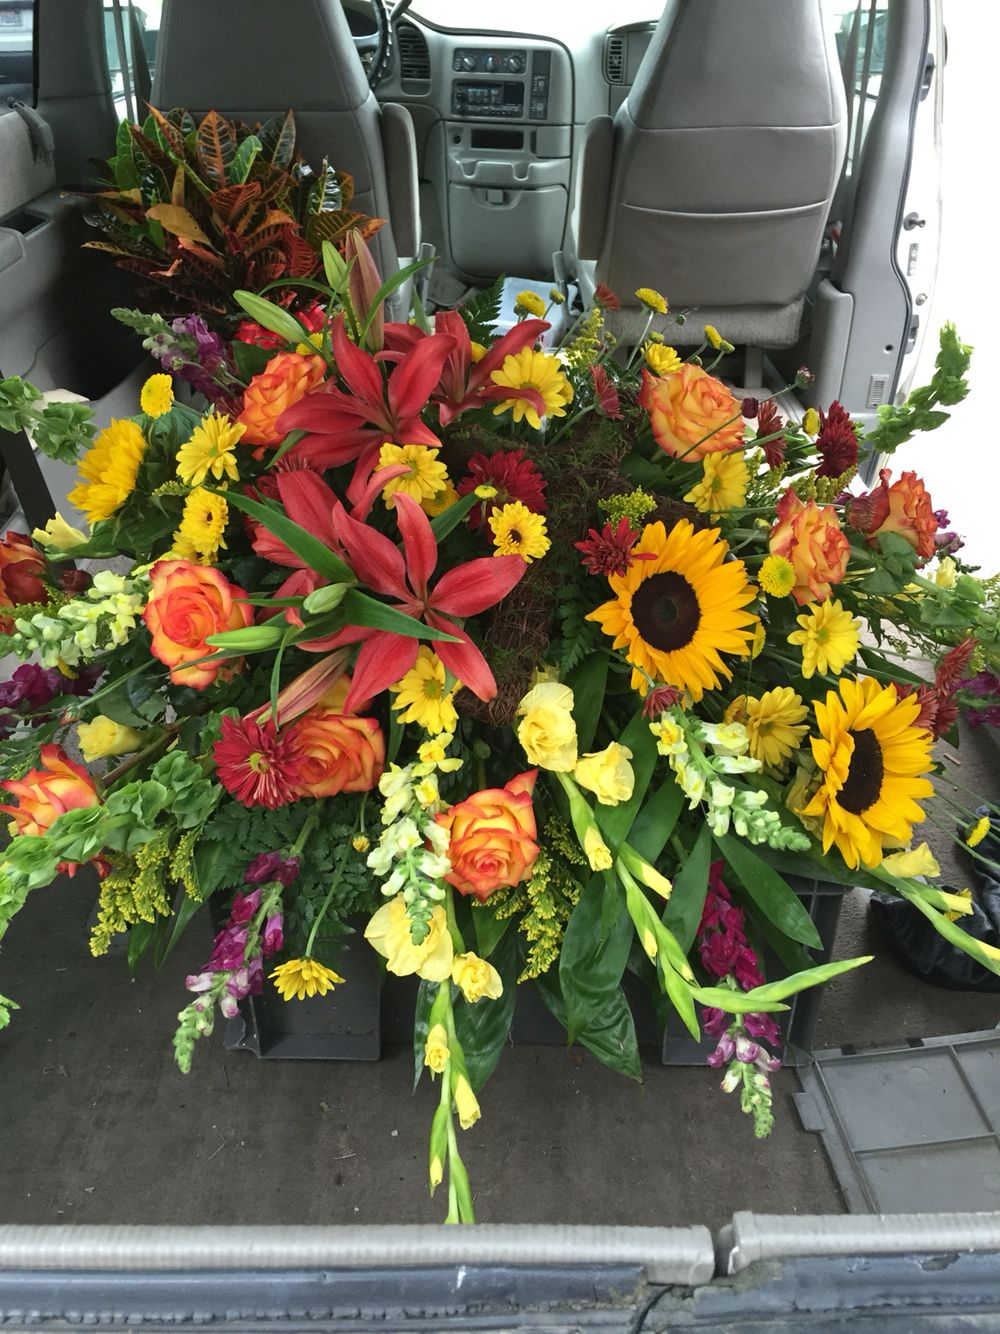 7 best wicker coffin floral arrangements images on ...  |Casket Flowers